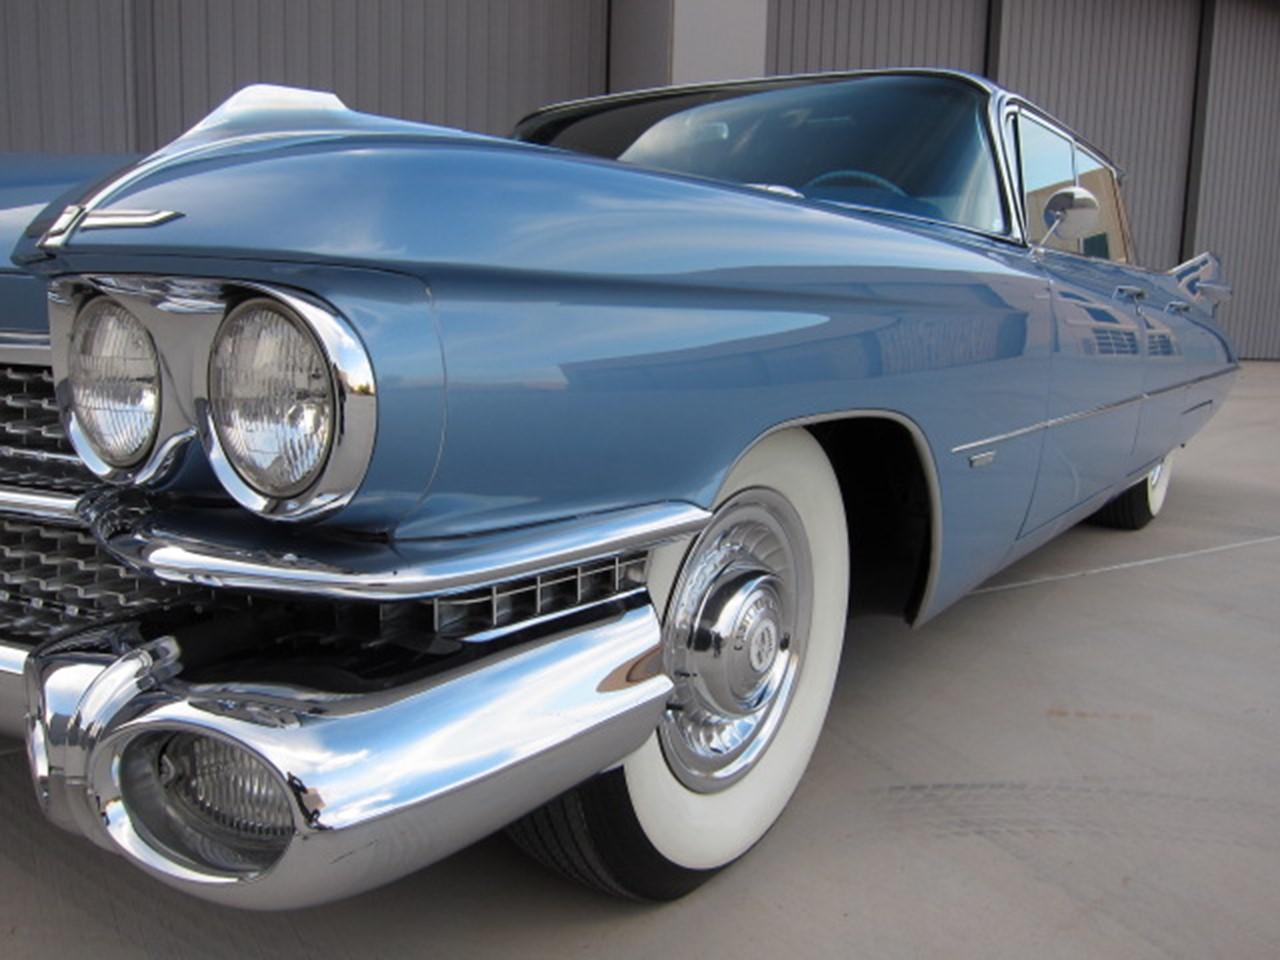 1959 Cadillac 3